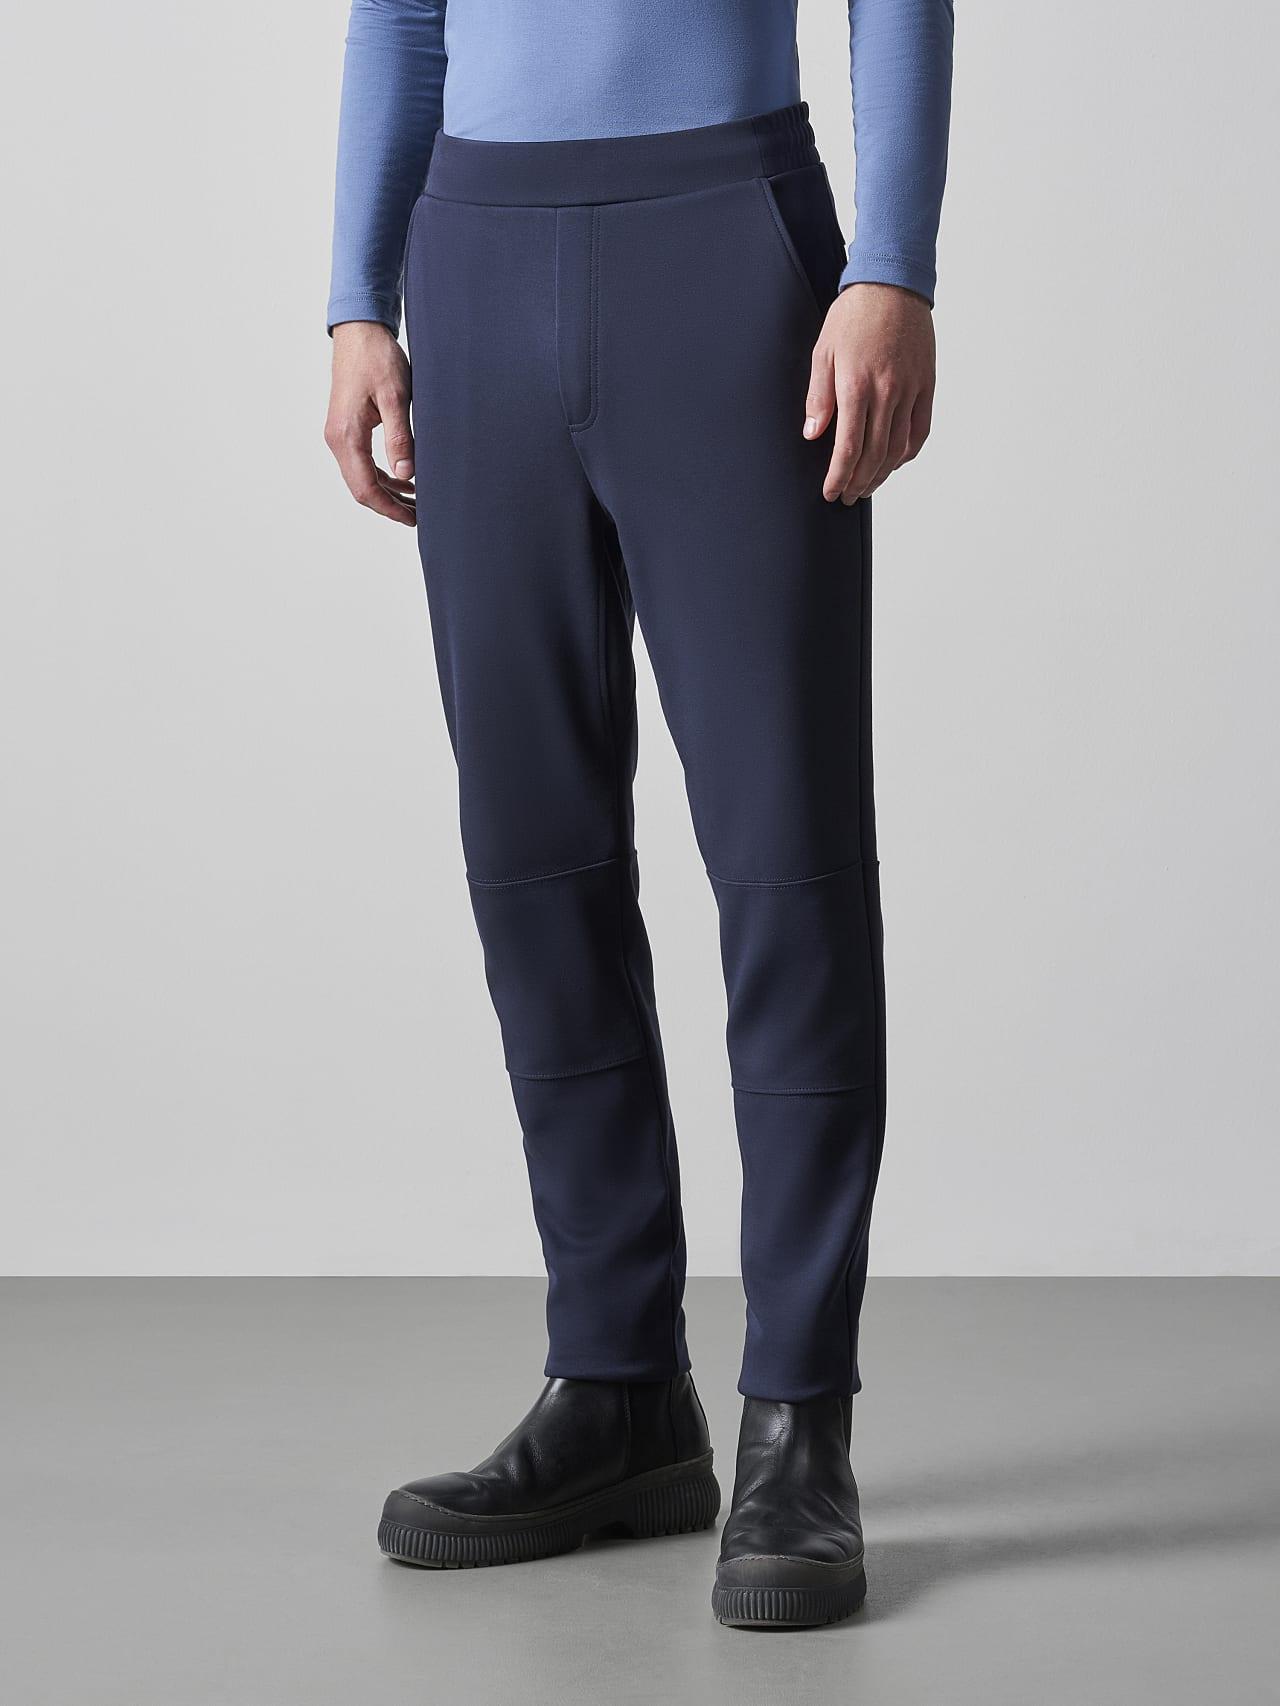 PRYK V7.Y5.02 Premium Sweatpants navy Front Alpha Tauri